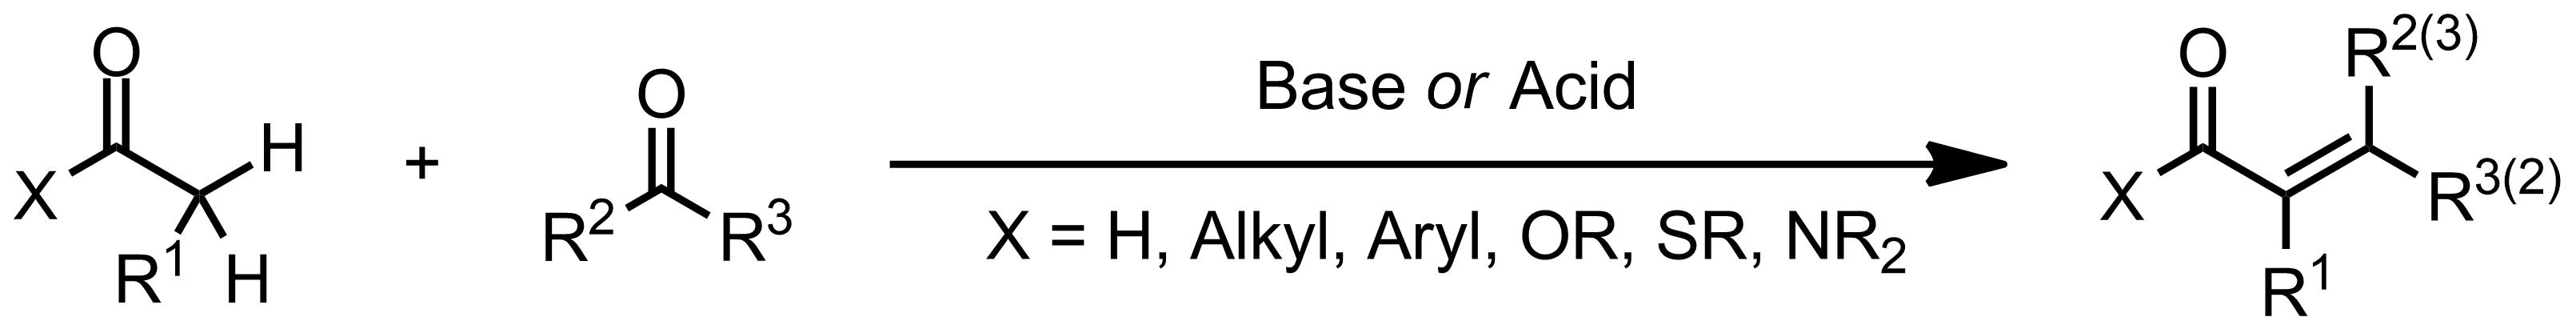 Schematic representation of the Aldol Condensation.